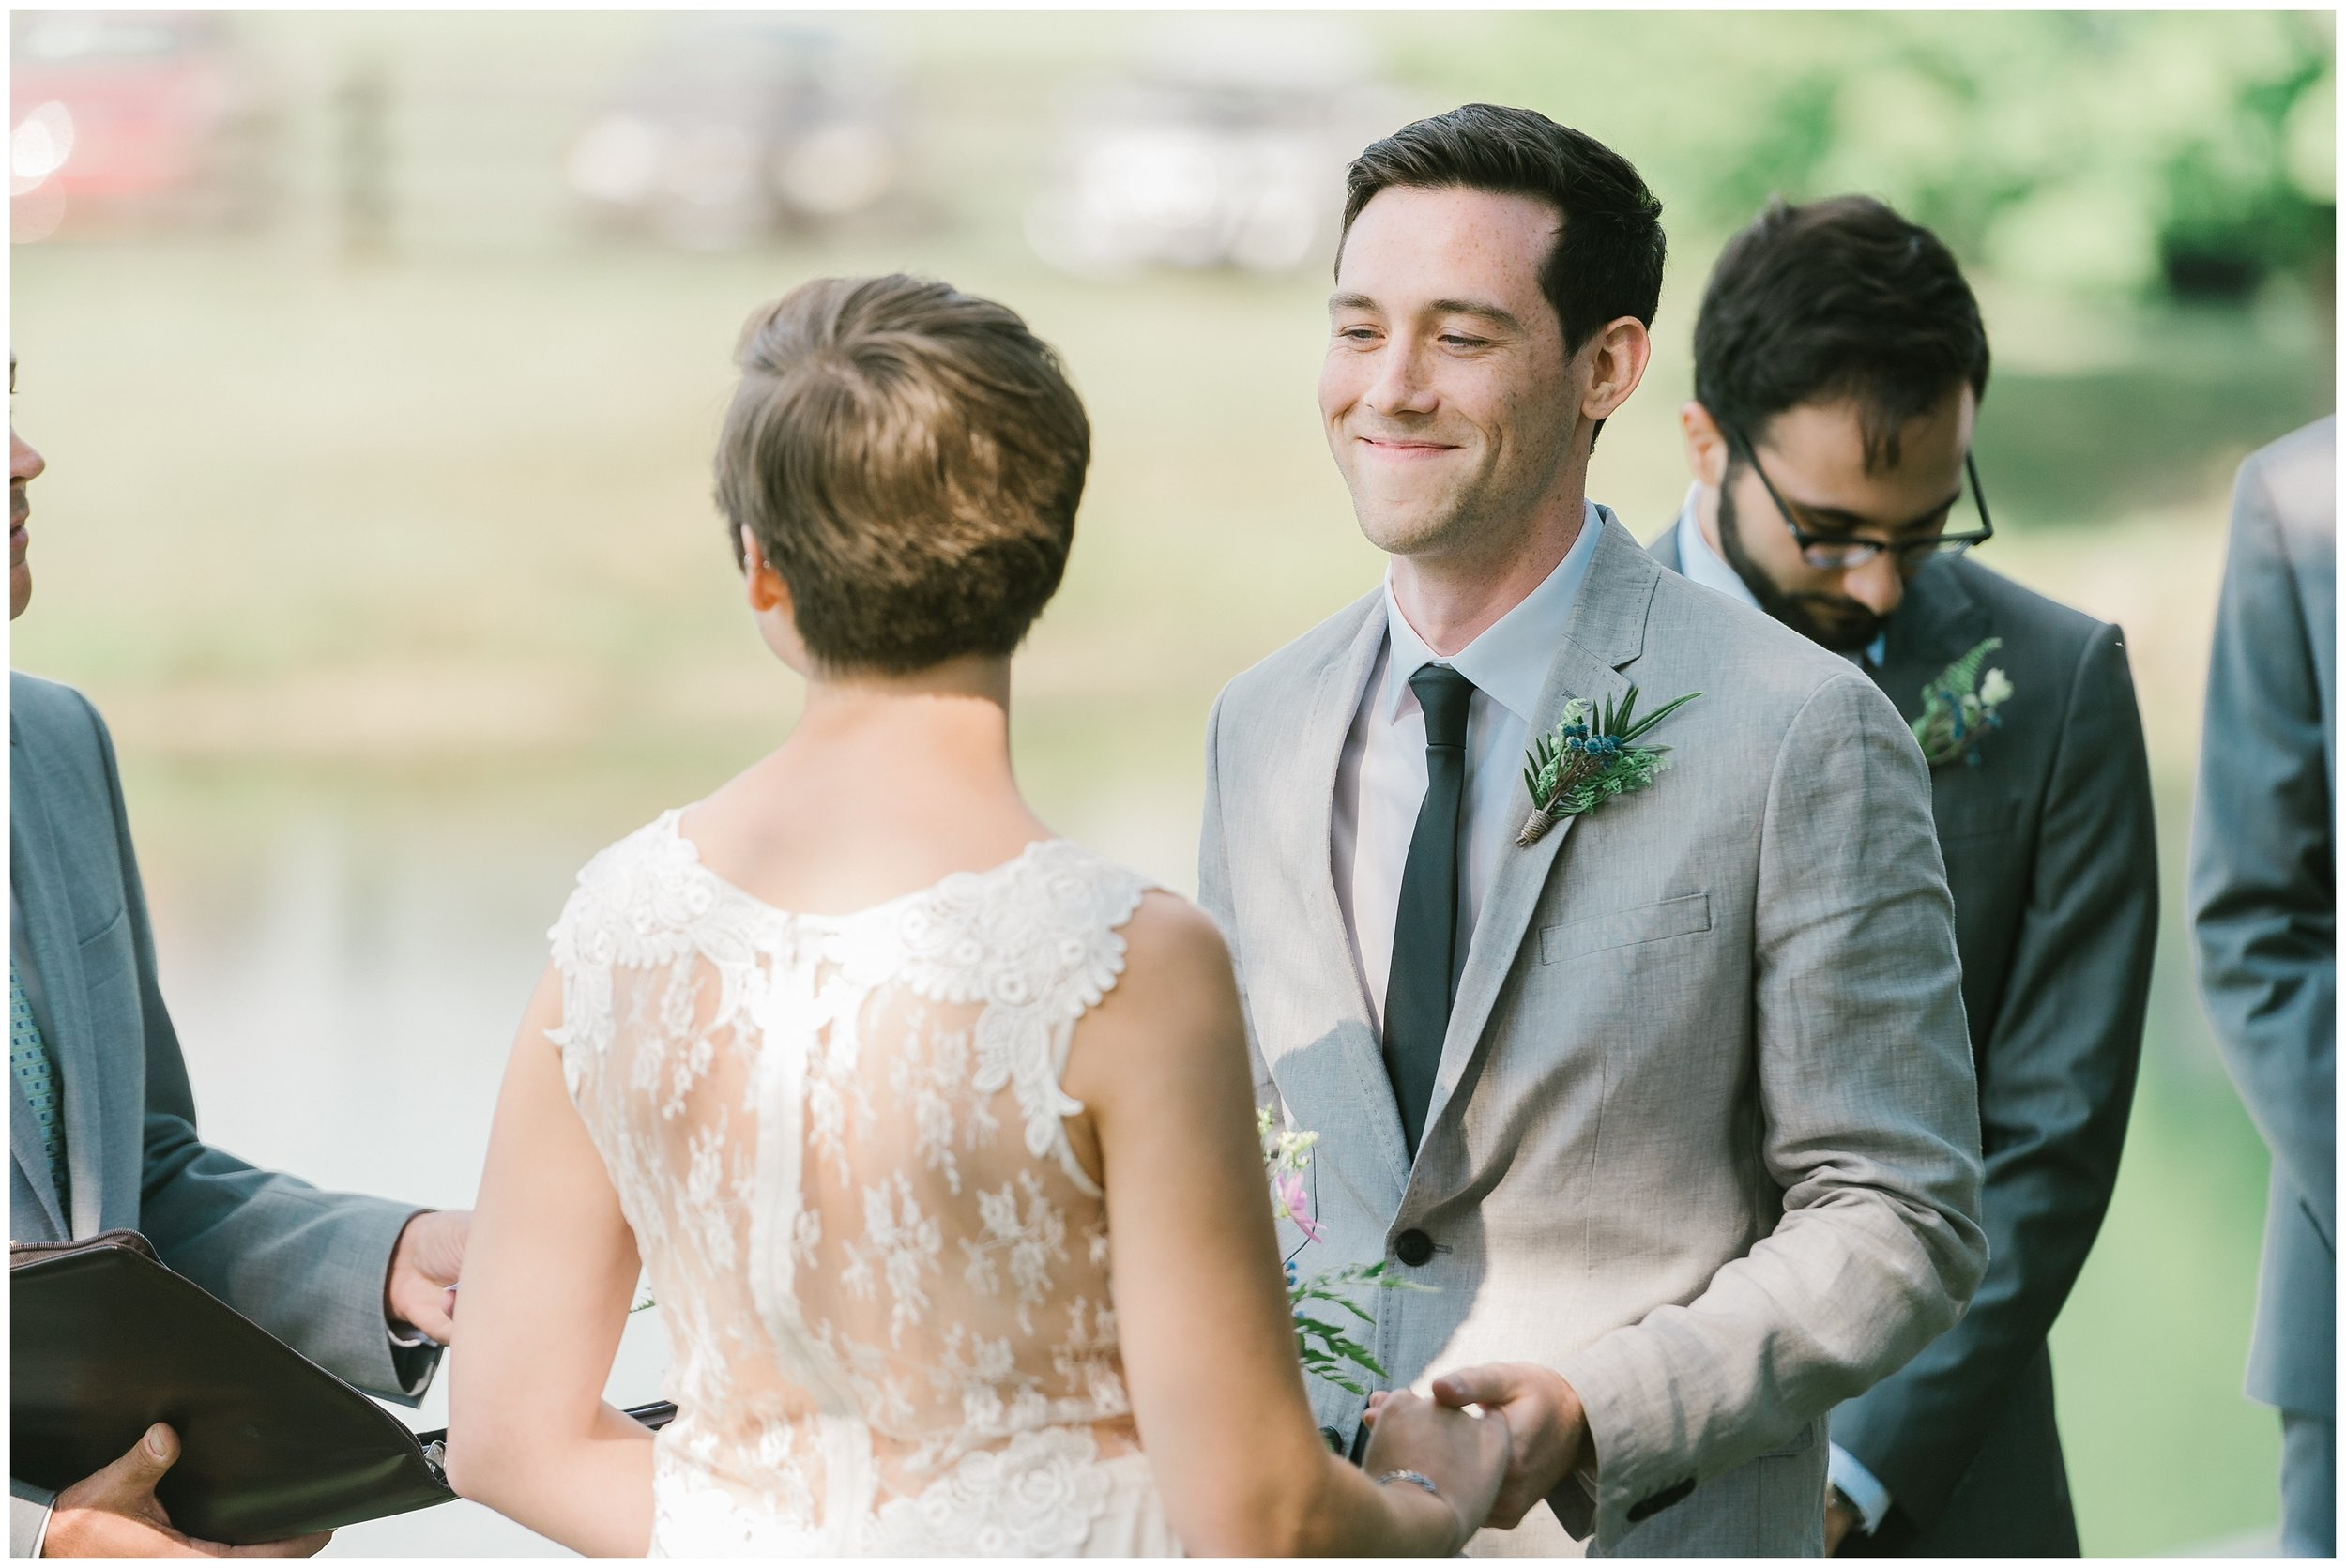 Rebecca_Shehorn_Photography_Indianapolis_Wedding_Photographer_7251.jpg